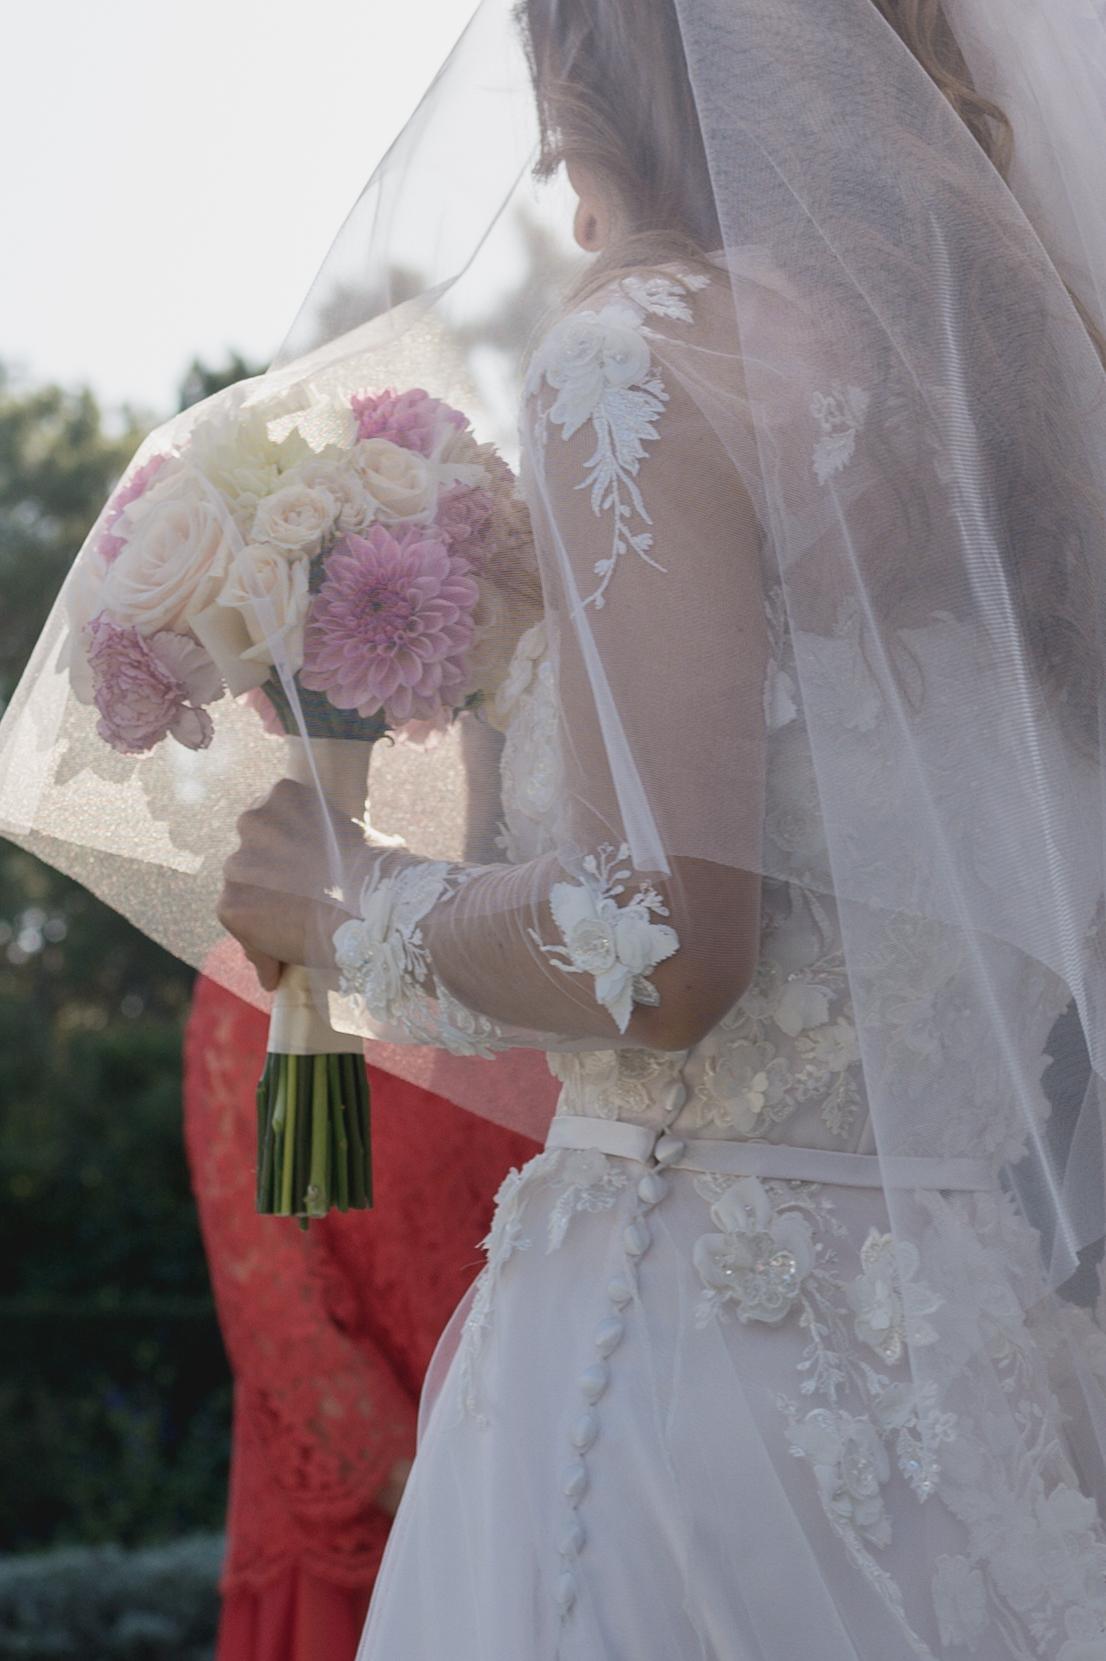 Leon_&_Martine's_Wedding_Photographs_17th_April_2019_@johnhenryweddingphoto_Low_Resolution_Web-245.JPG